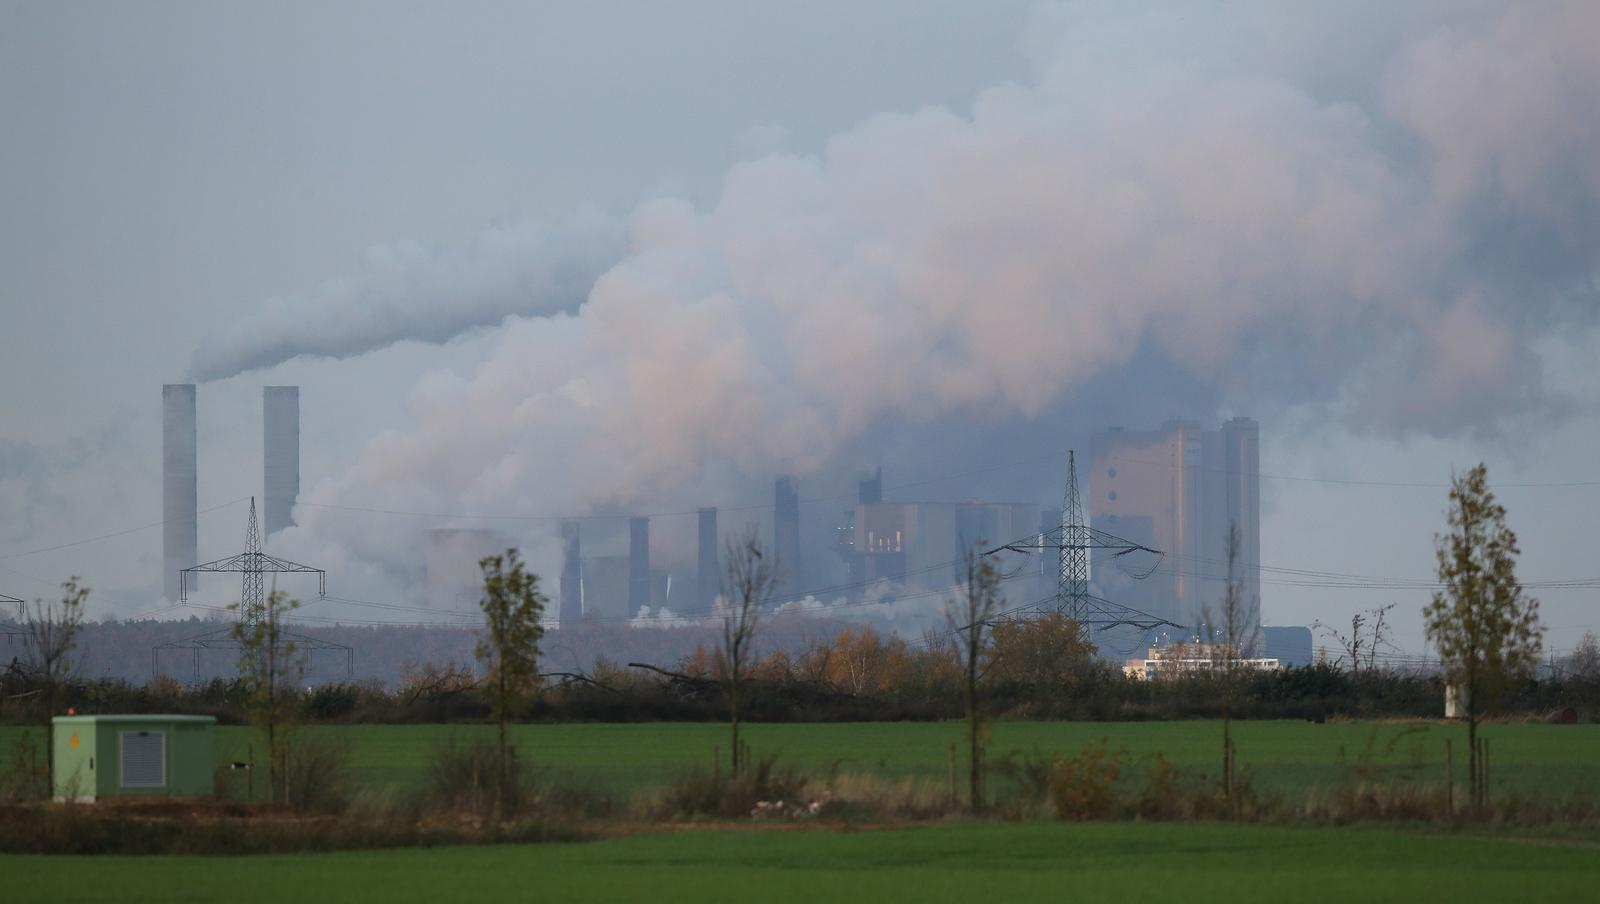 Limits on US coal plant emissions unnecessary - EPA